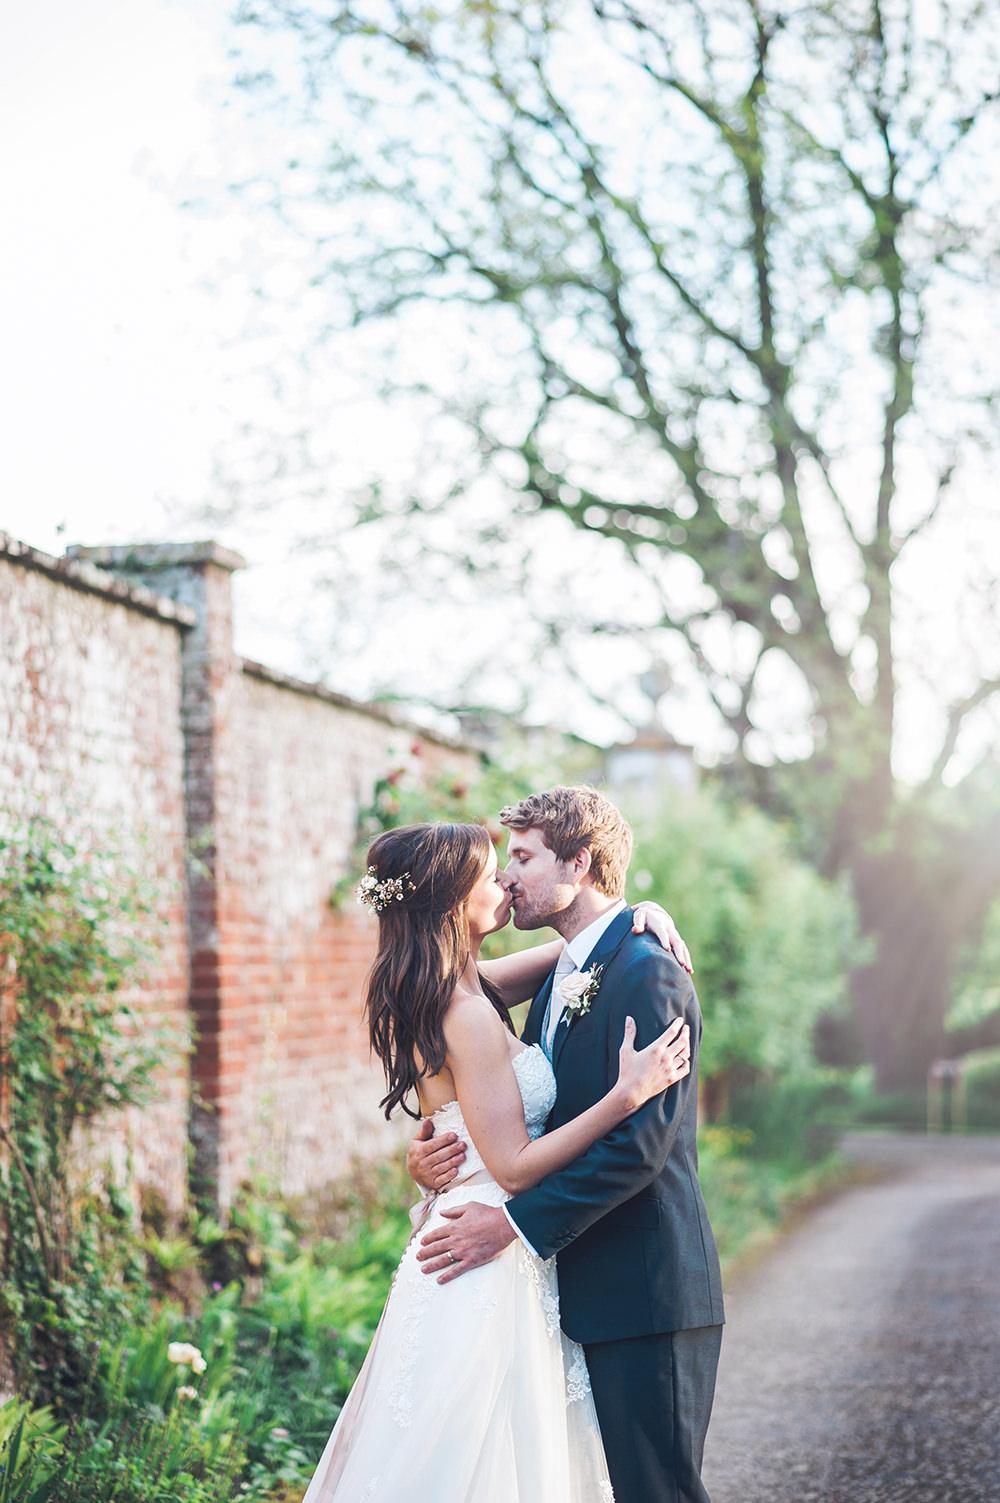 Bride Bridal Gown Dress Strapless Sweetheart Neckline Ribbon Belt Pink Blue Suit Groom Edmondsham House Wedding Darima Frampton Photography